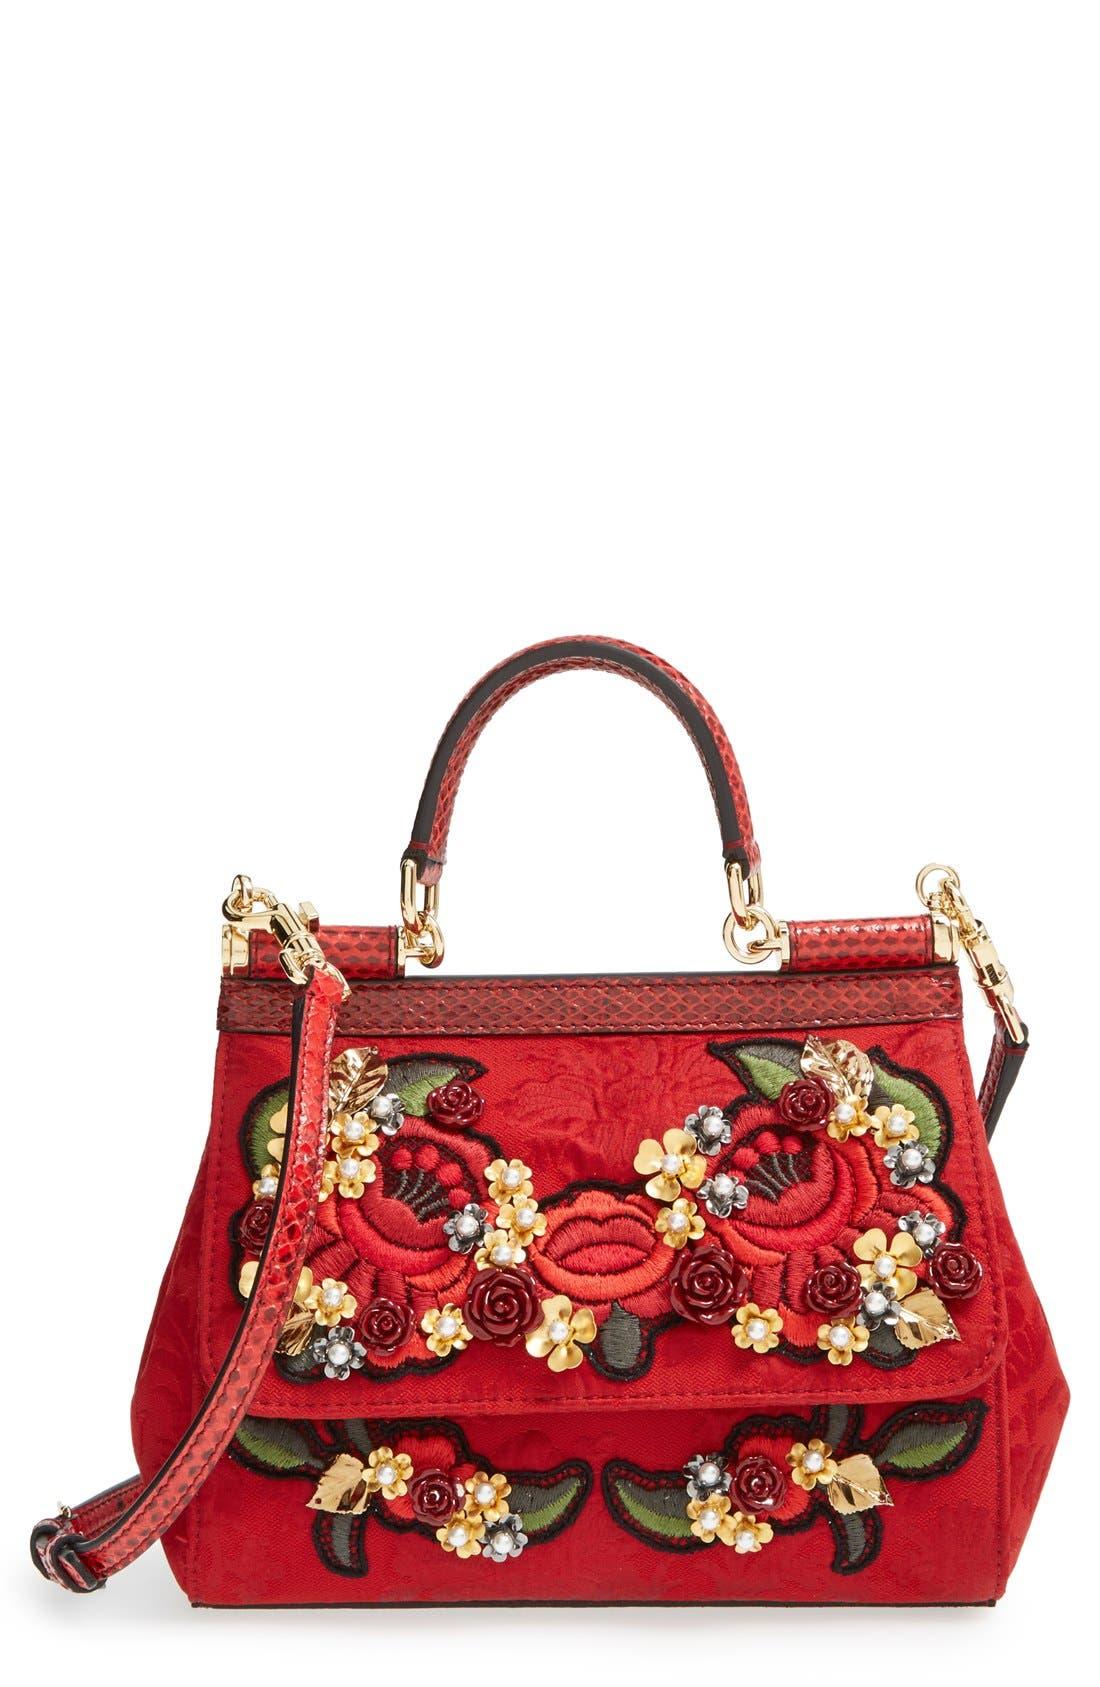 Alternate Image 1 Selected - Dolce&Gabbana 'Miss Sicily' Floral Brocade Satchel